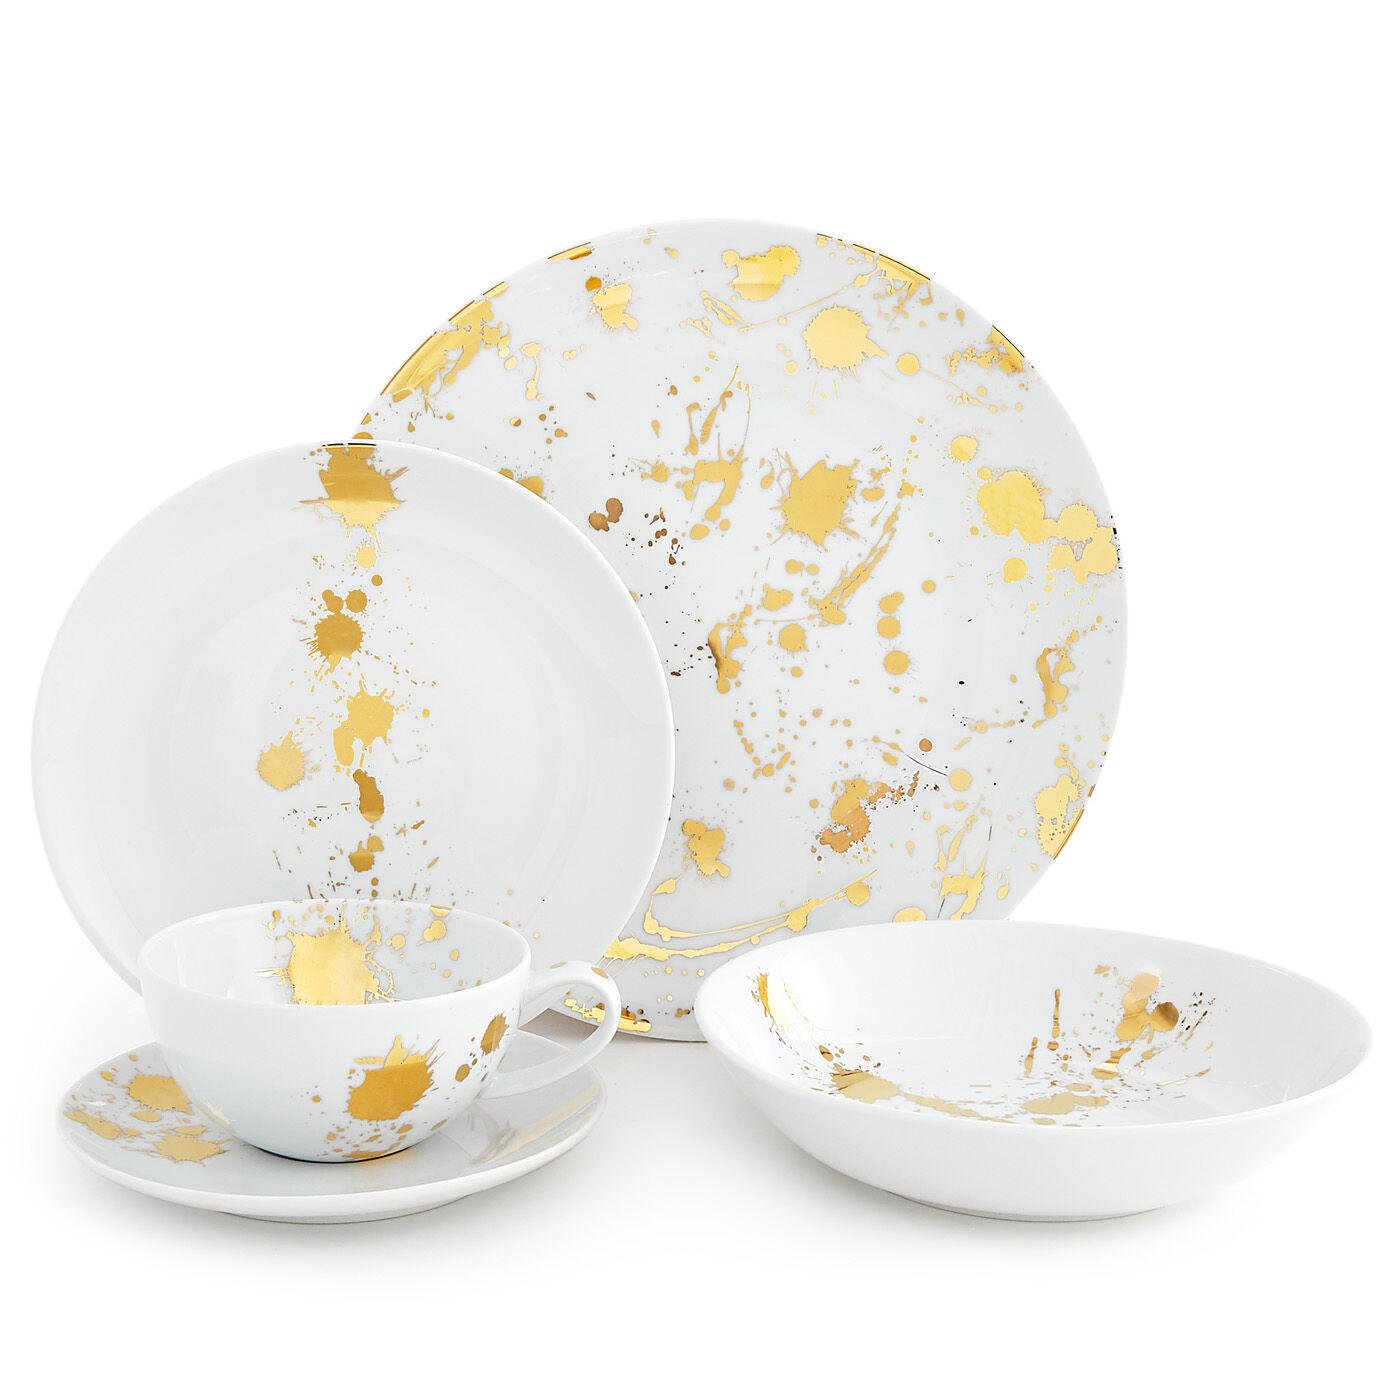 dinnerware sets fivepiece dinner set - Modern Dinnerware